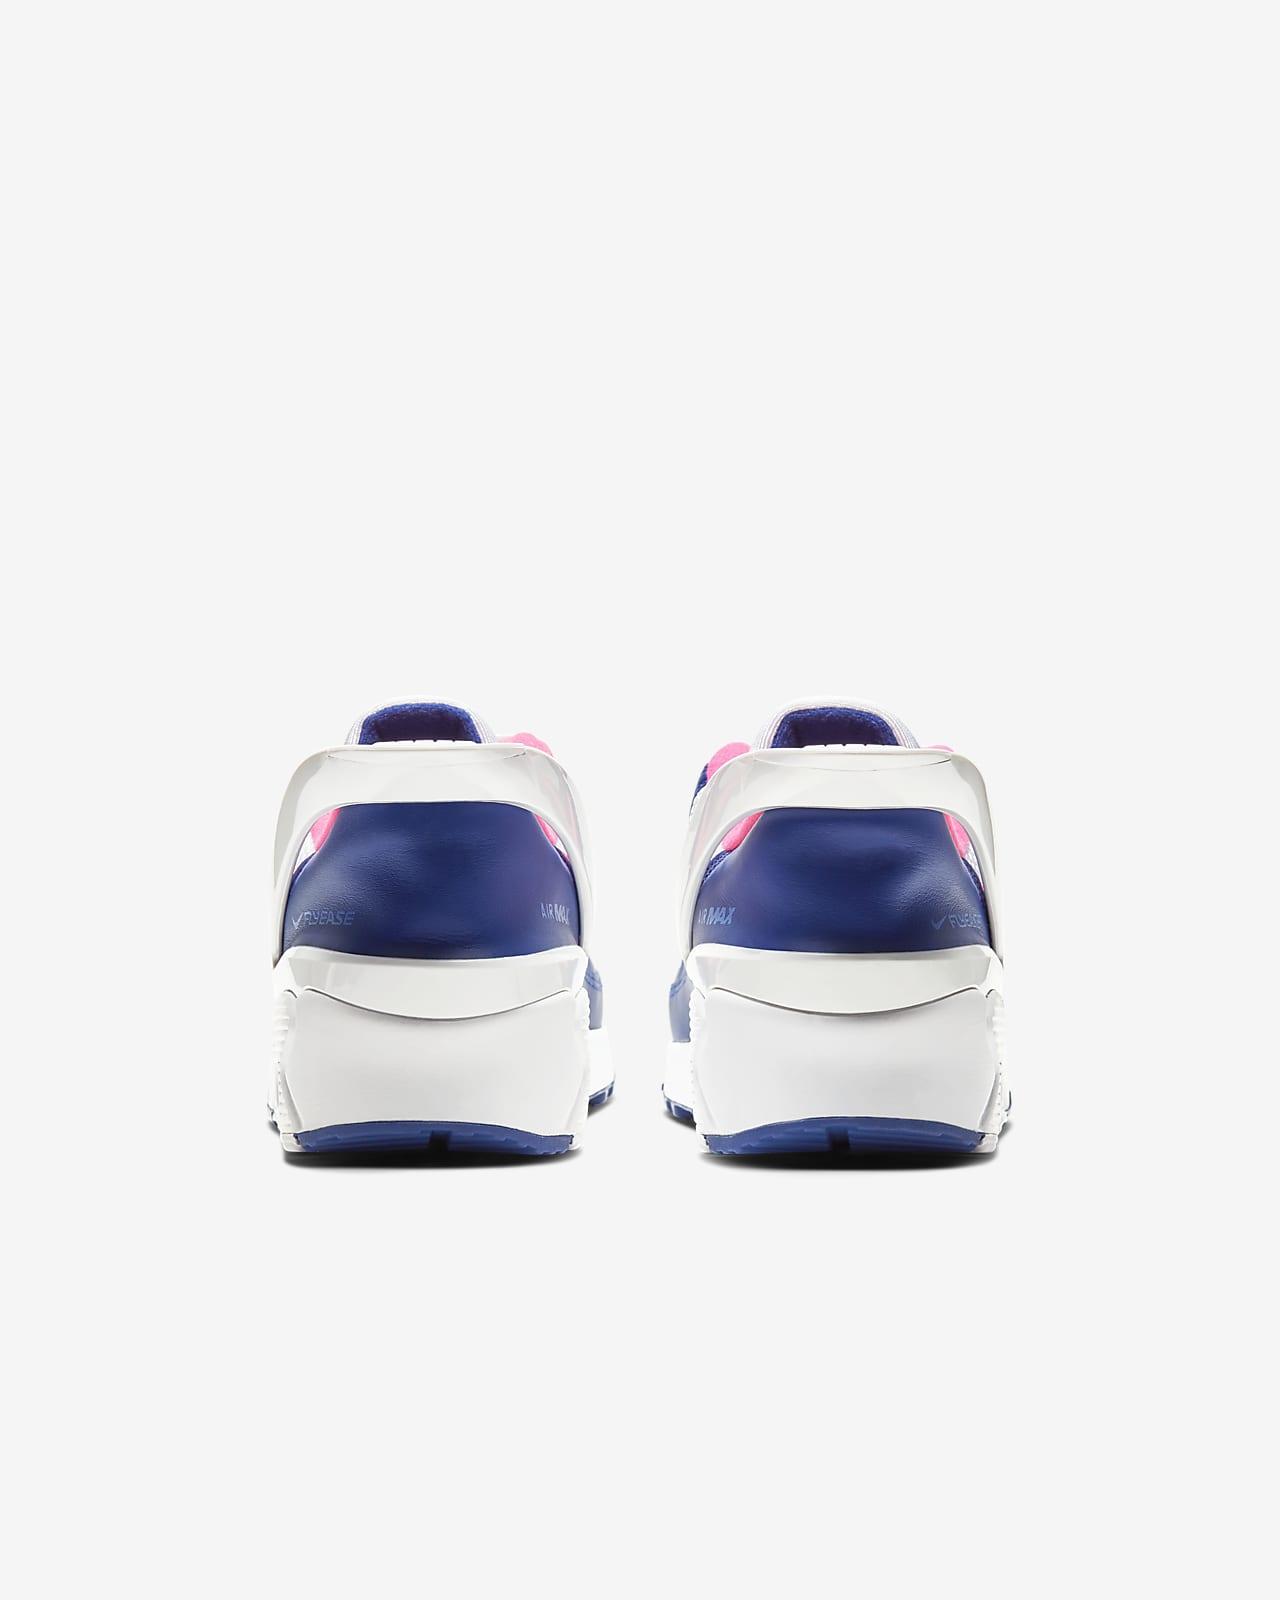 DEEP THOTS | Vintage nike, Old nikes, Sneakers